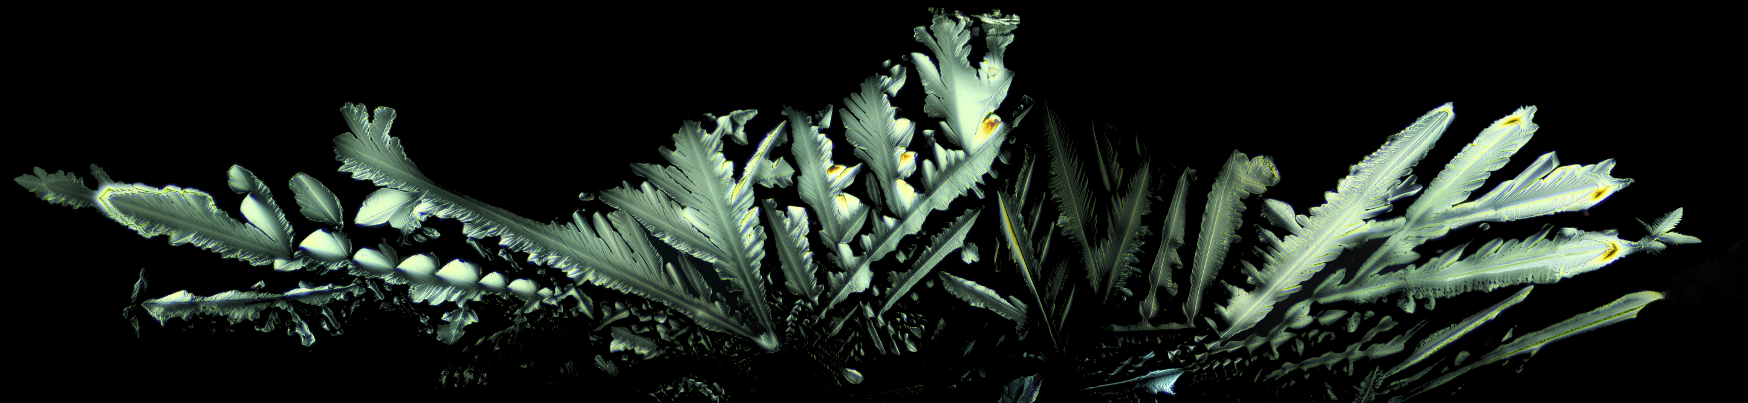 Crystalline Feathers